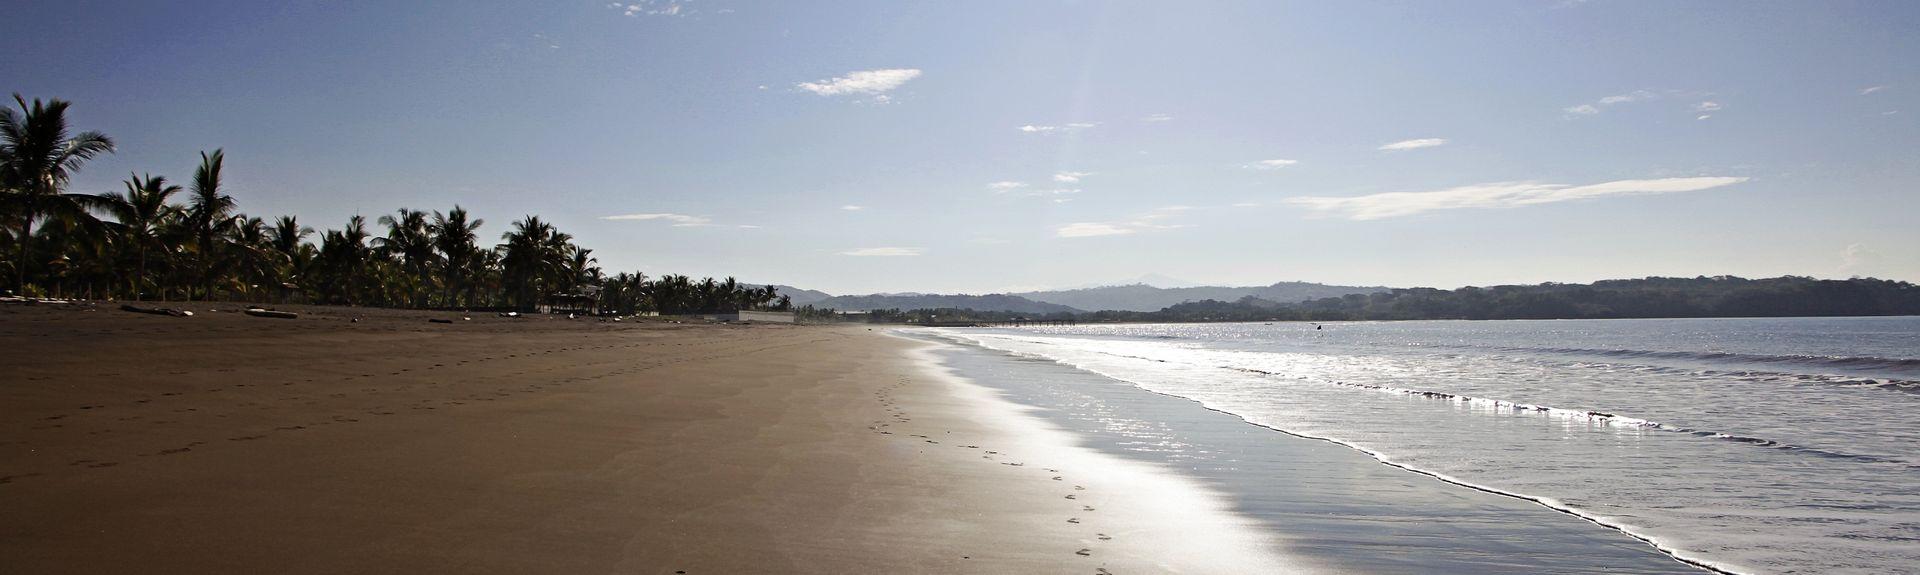 Barranca, Puntarenas (province), Costa Rica